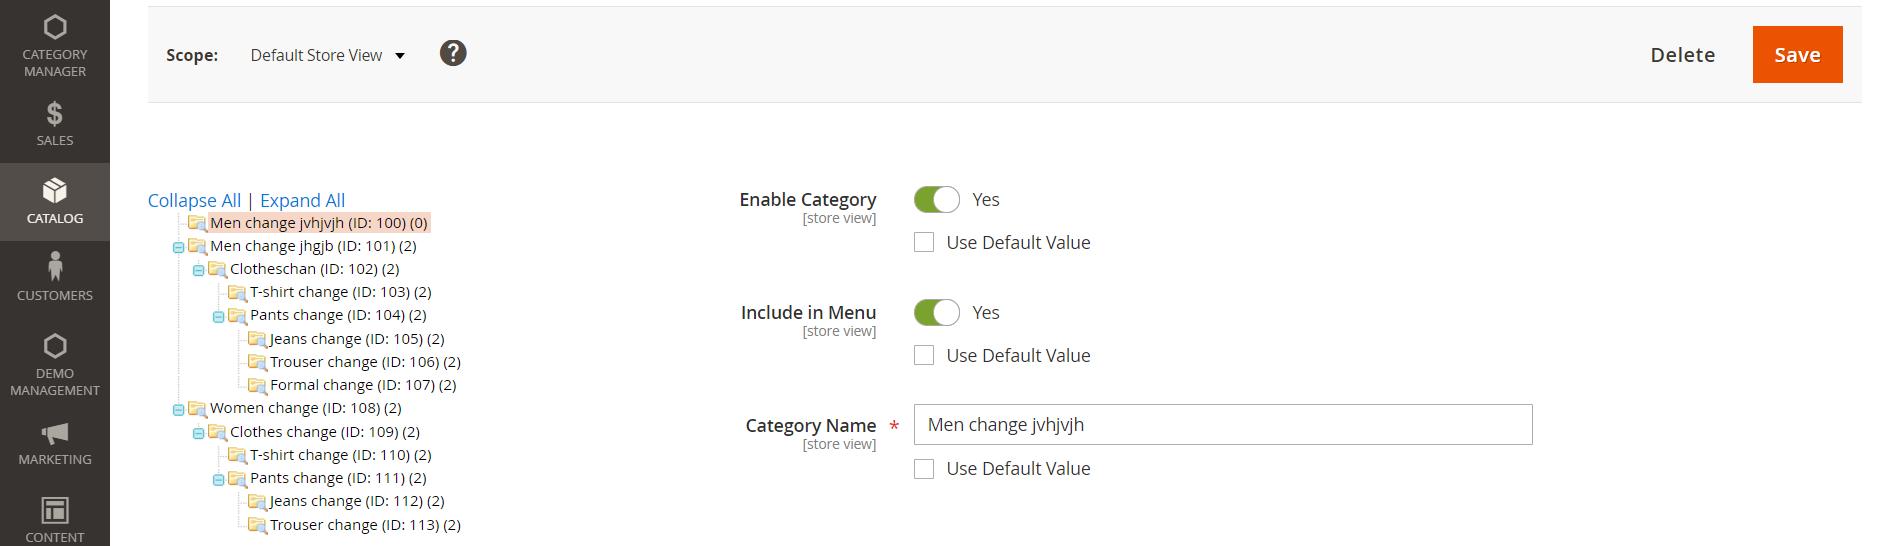 Men-change-jvhjvjh-ID-100-Categories-Inventory-Catalog-Magento-Admin